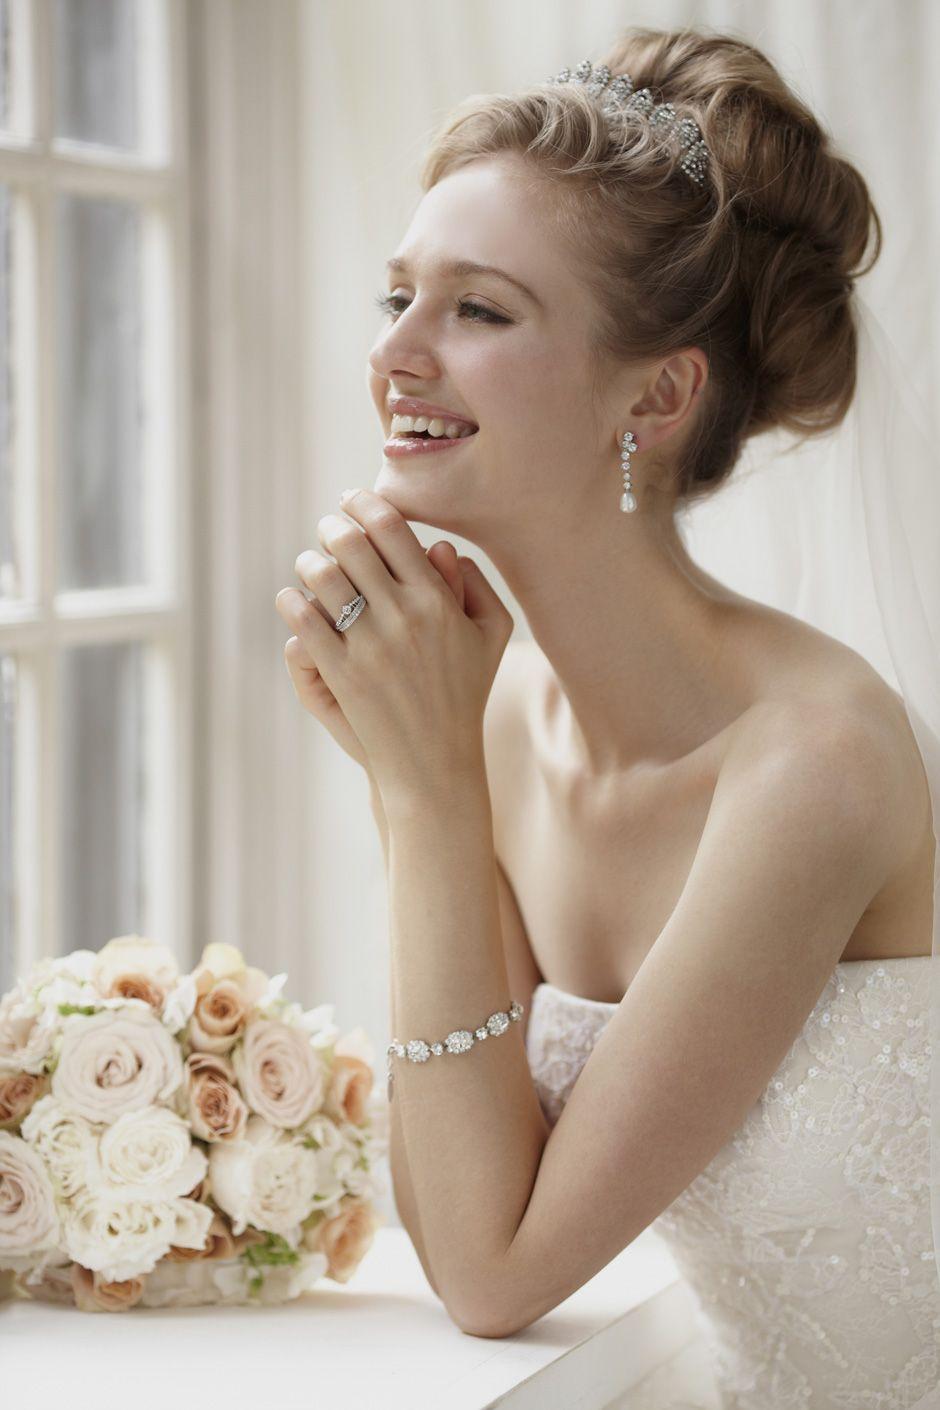 Novarese Wedding Accessory Ring Earring Hedaccessory Tiara